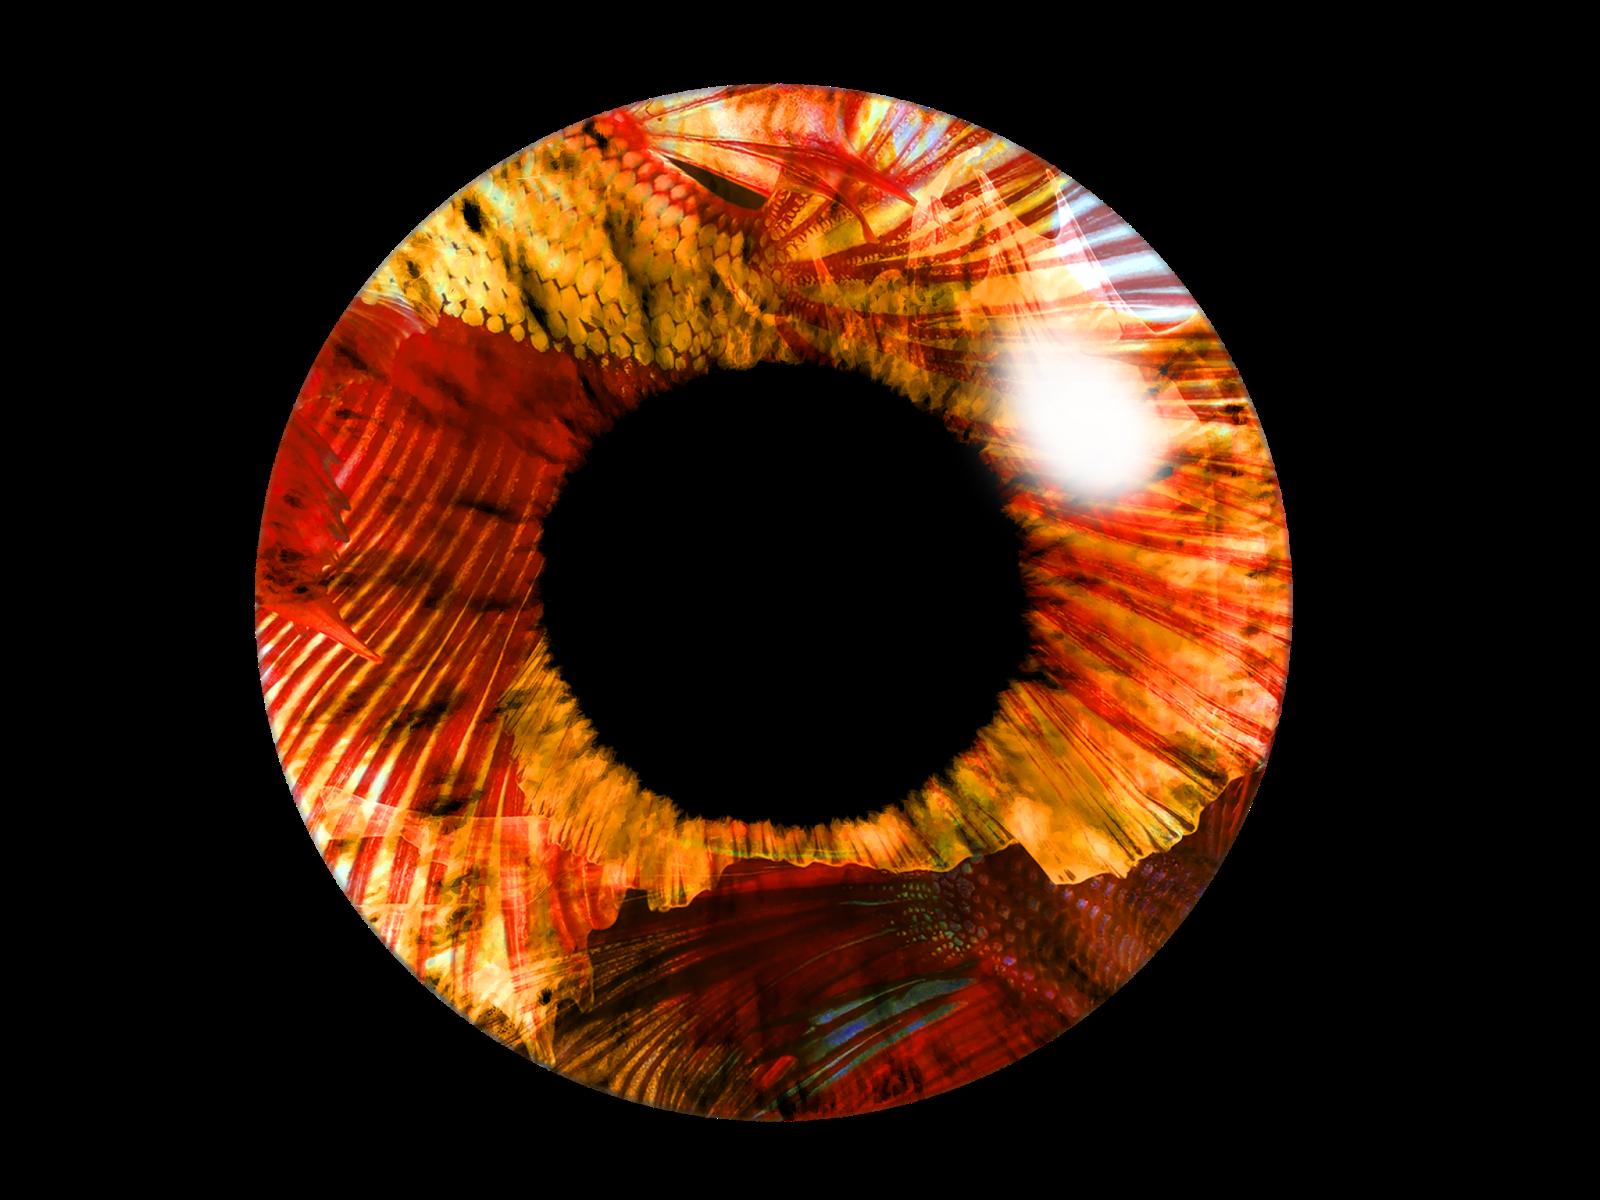 Eye Lens PNG Image HD.